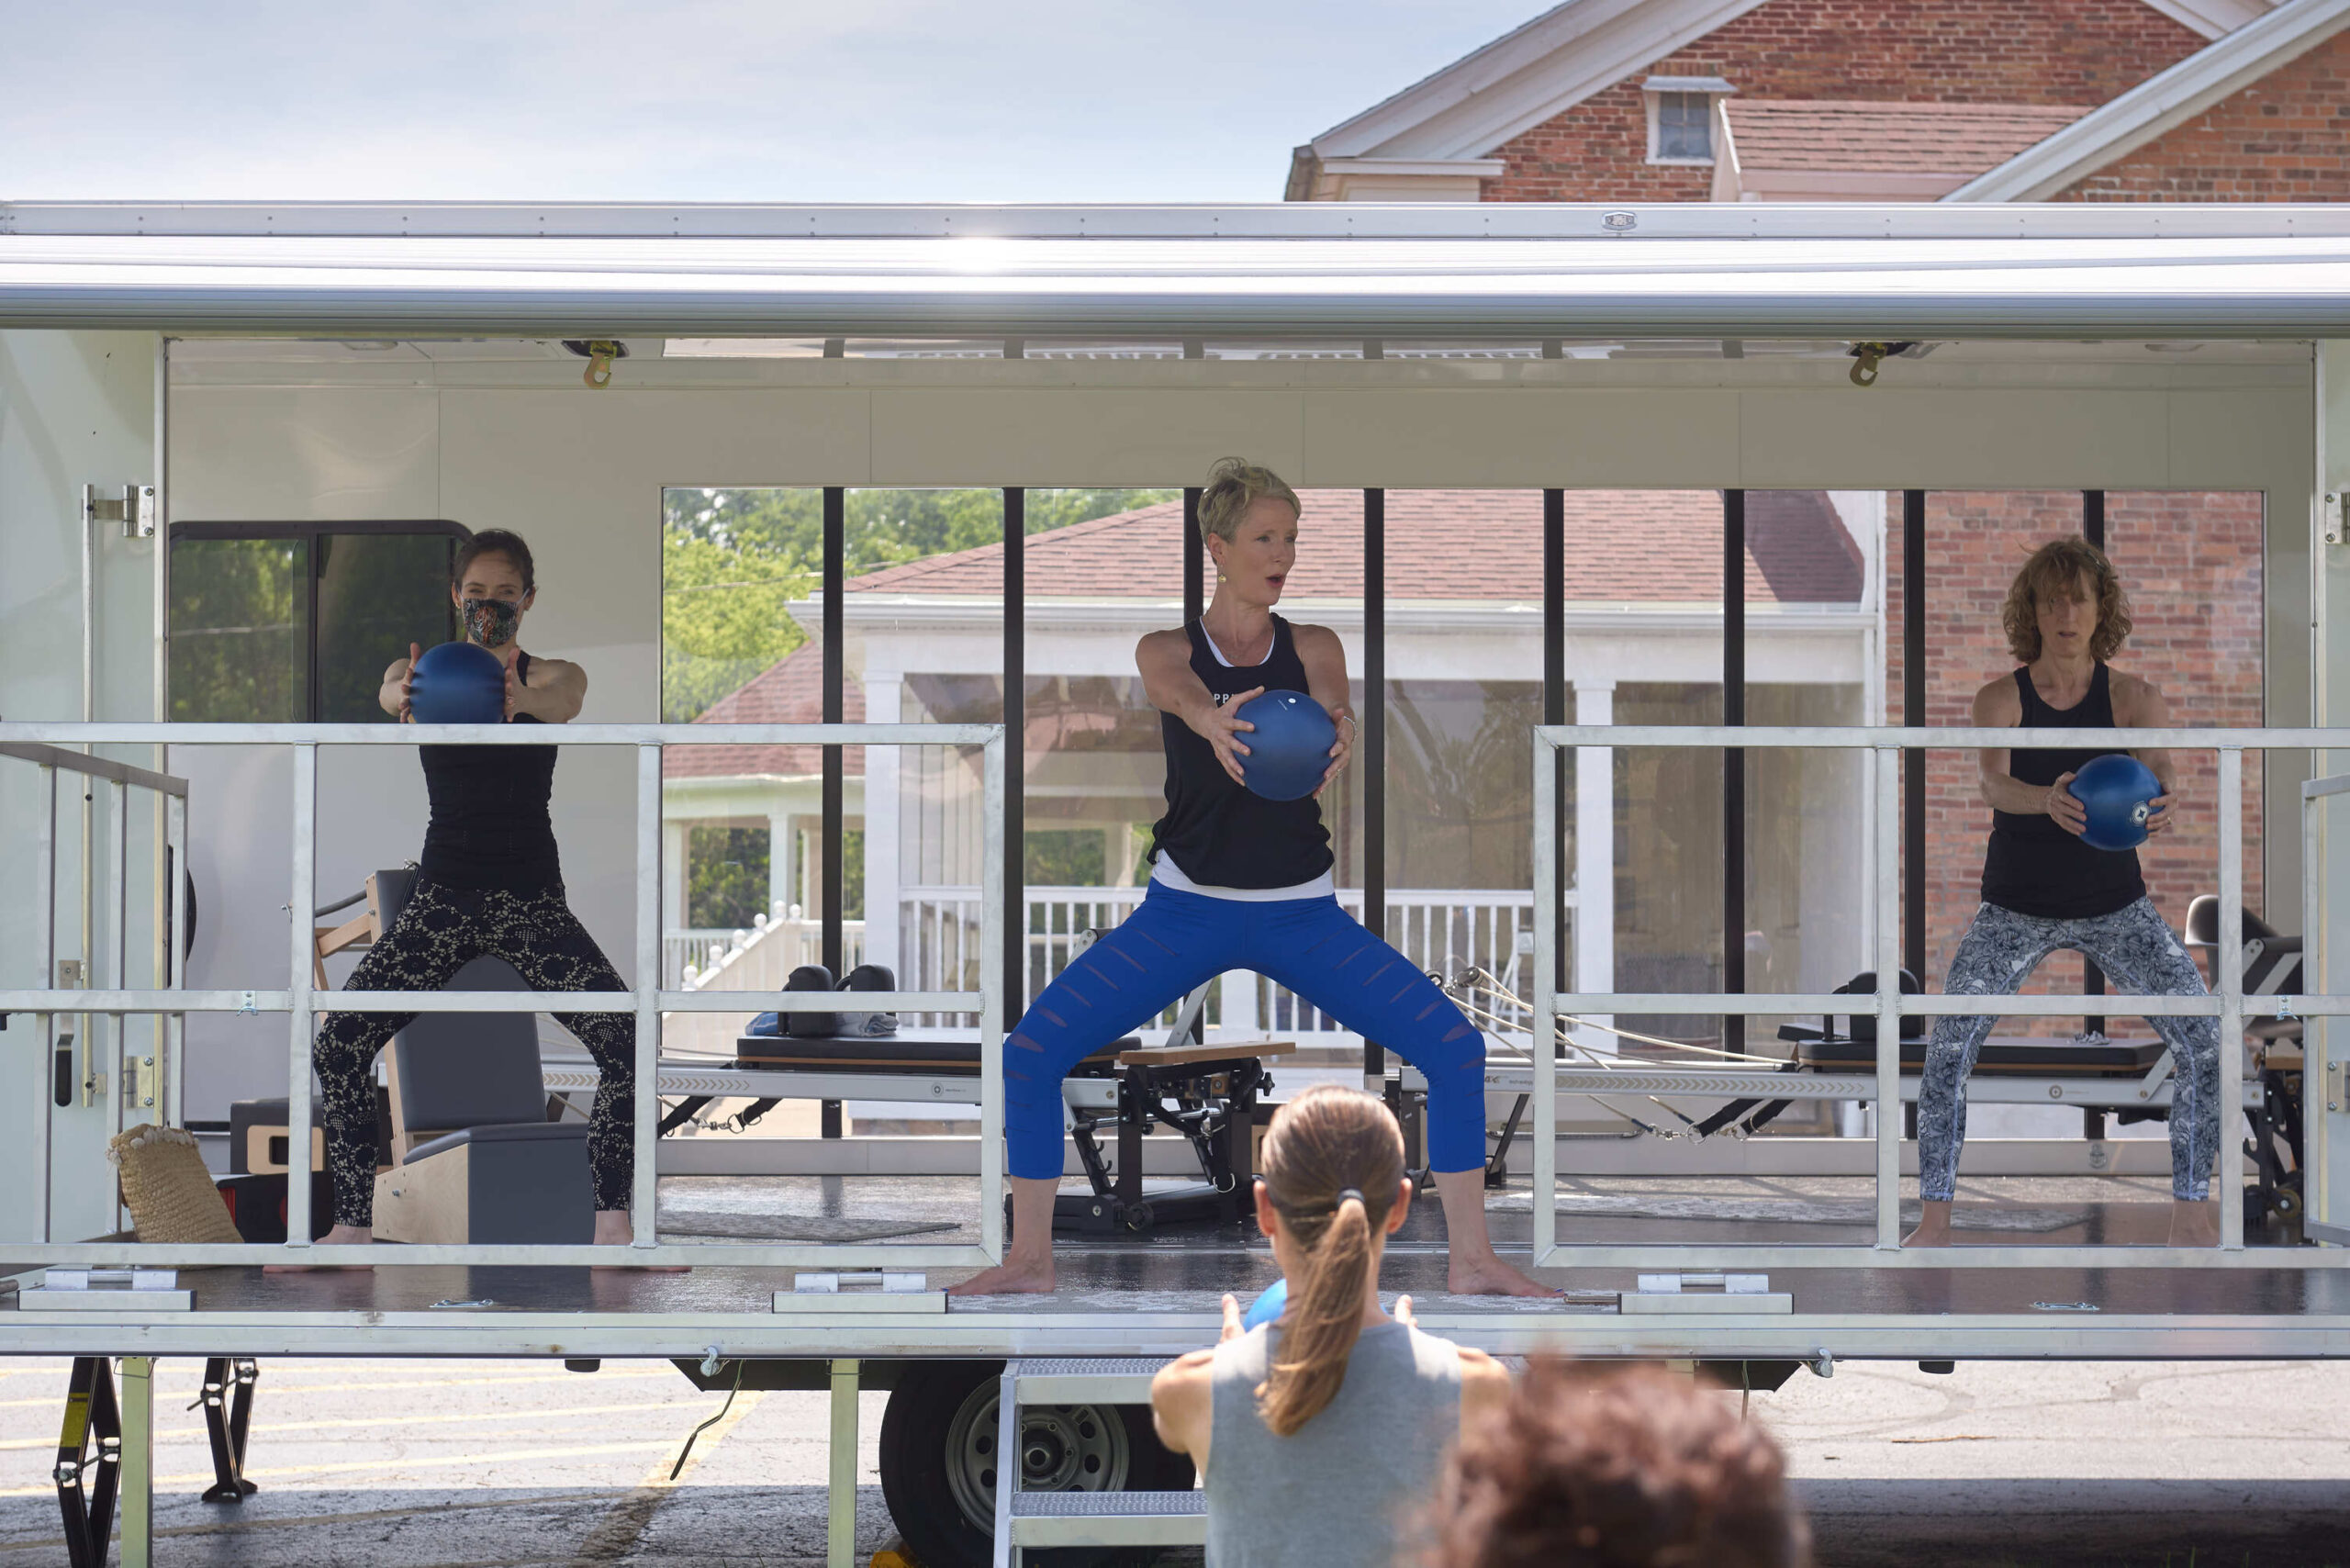 The Movement FLX at Cobblestone Arts Center, Farmington, NY. Photo ⒸBrandon Vick, https://www.brandonvickphotography.com/